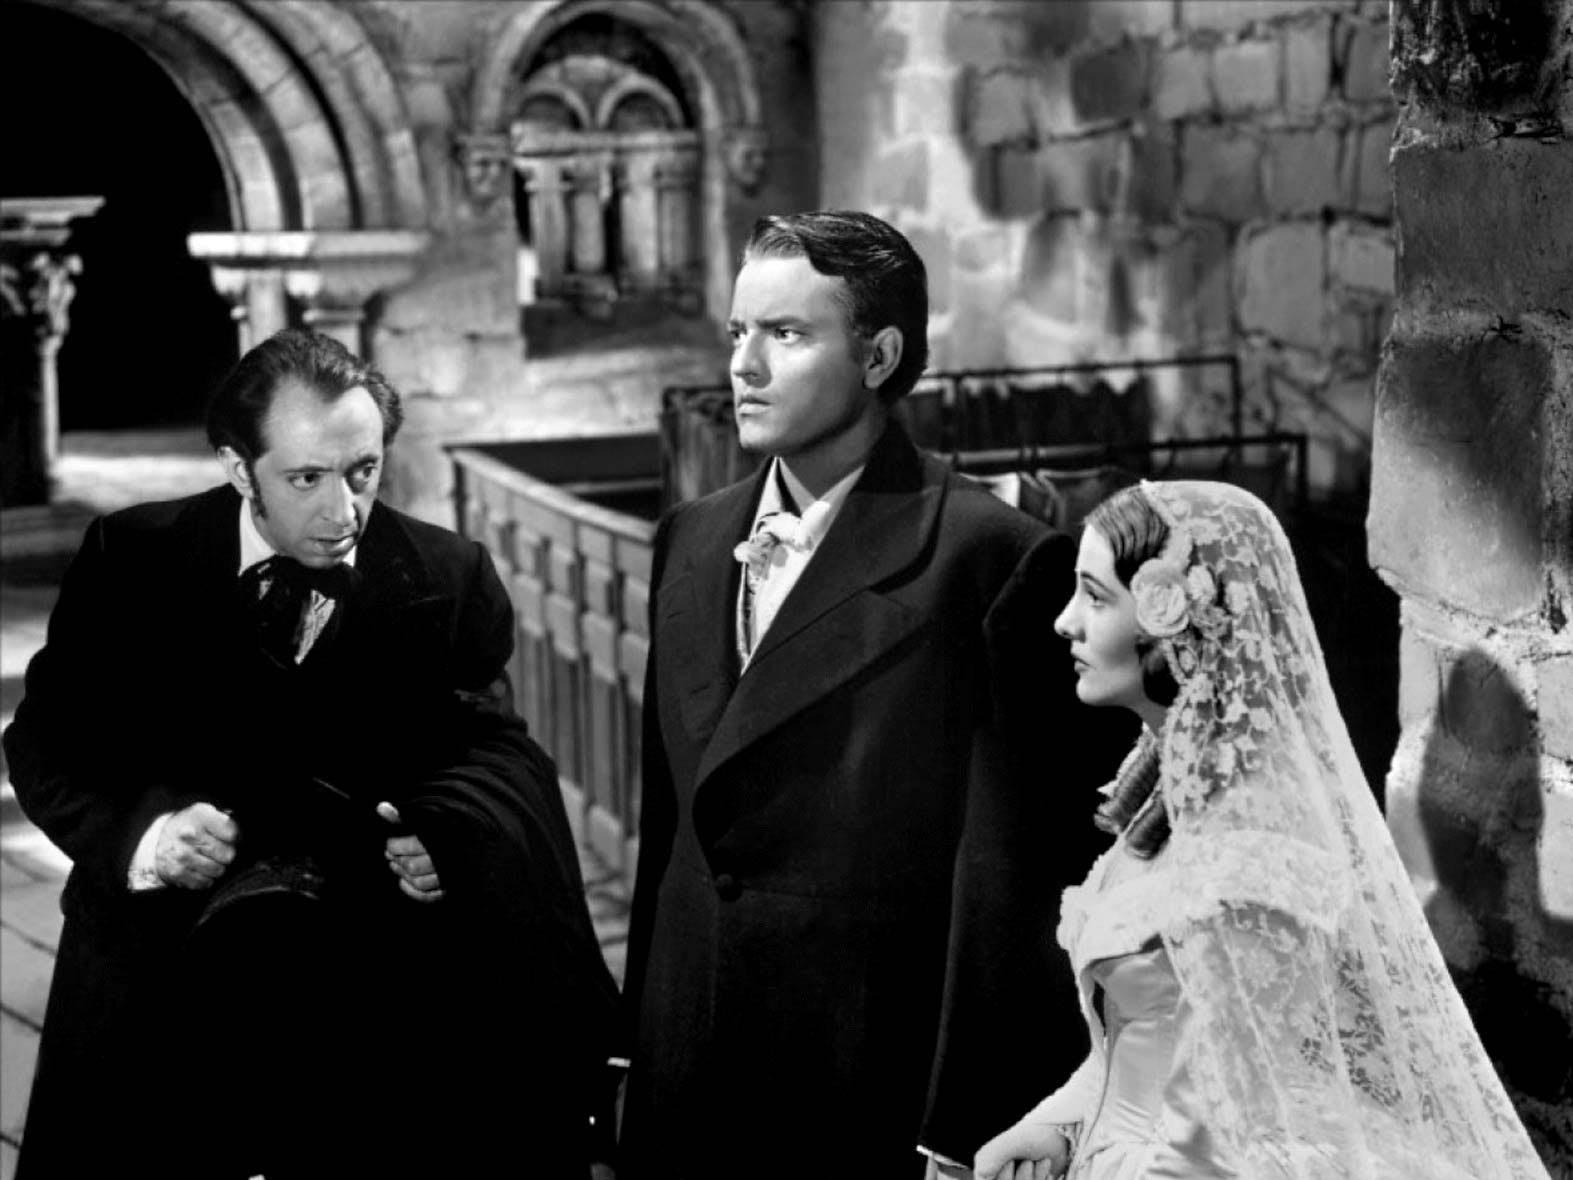 Jane Eyre scene Orson Welles